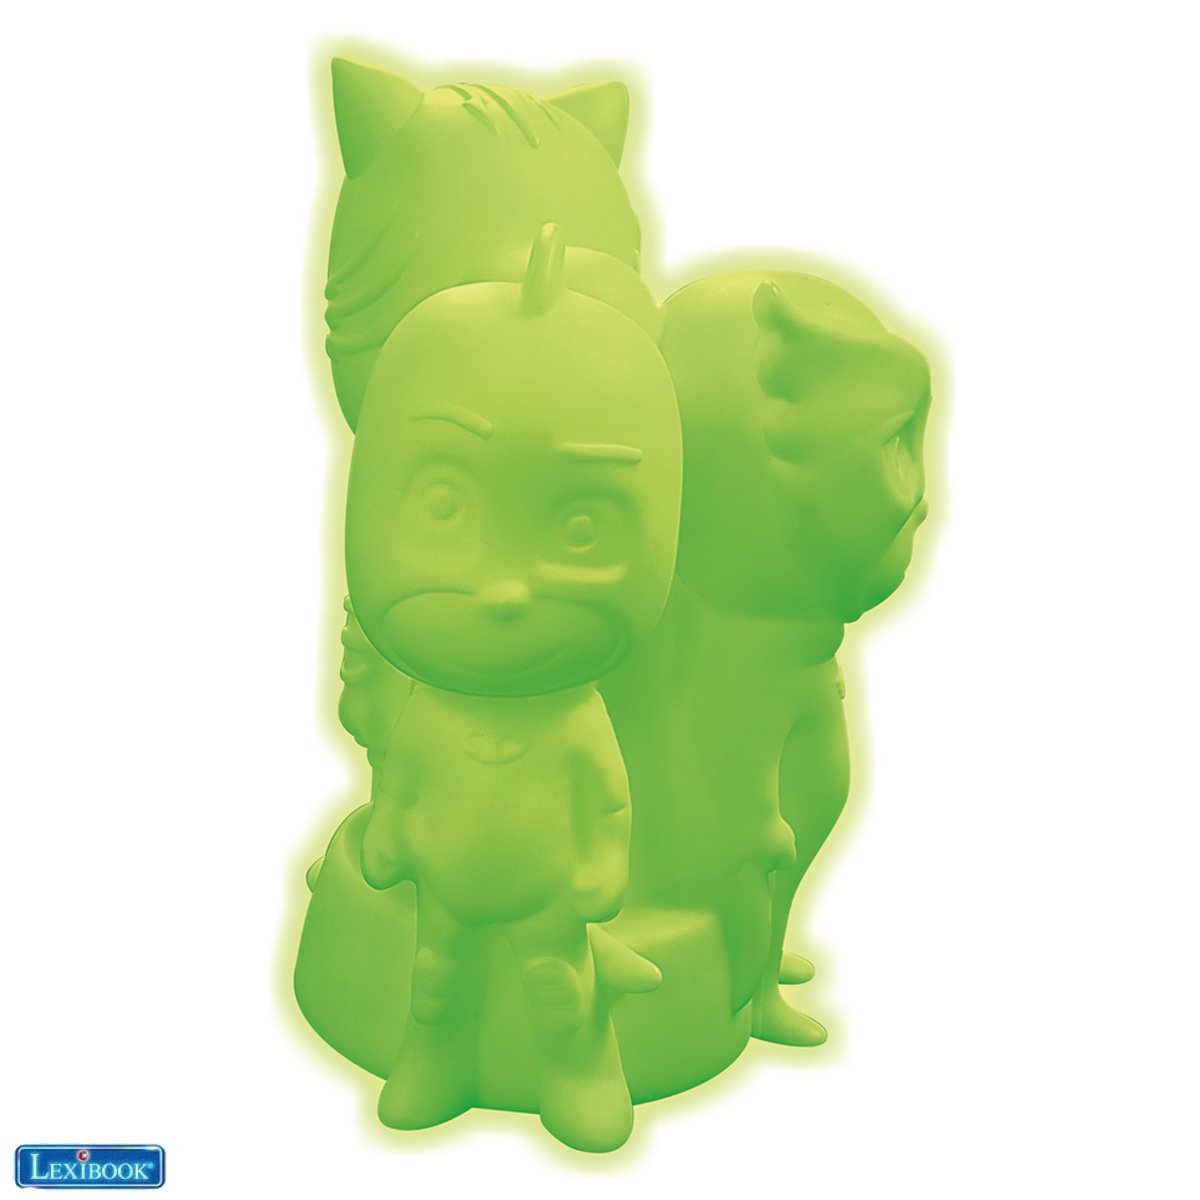 Lexibook - 3D PJ Masks design colour change night light approx. 20cm (NLJ005PJM)